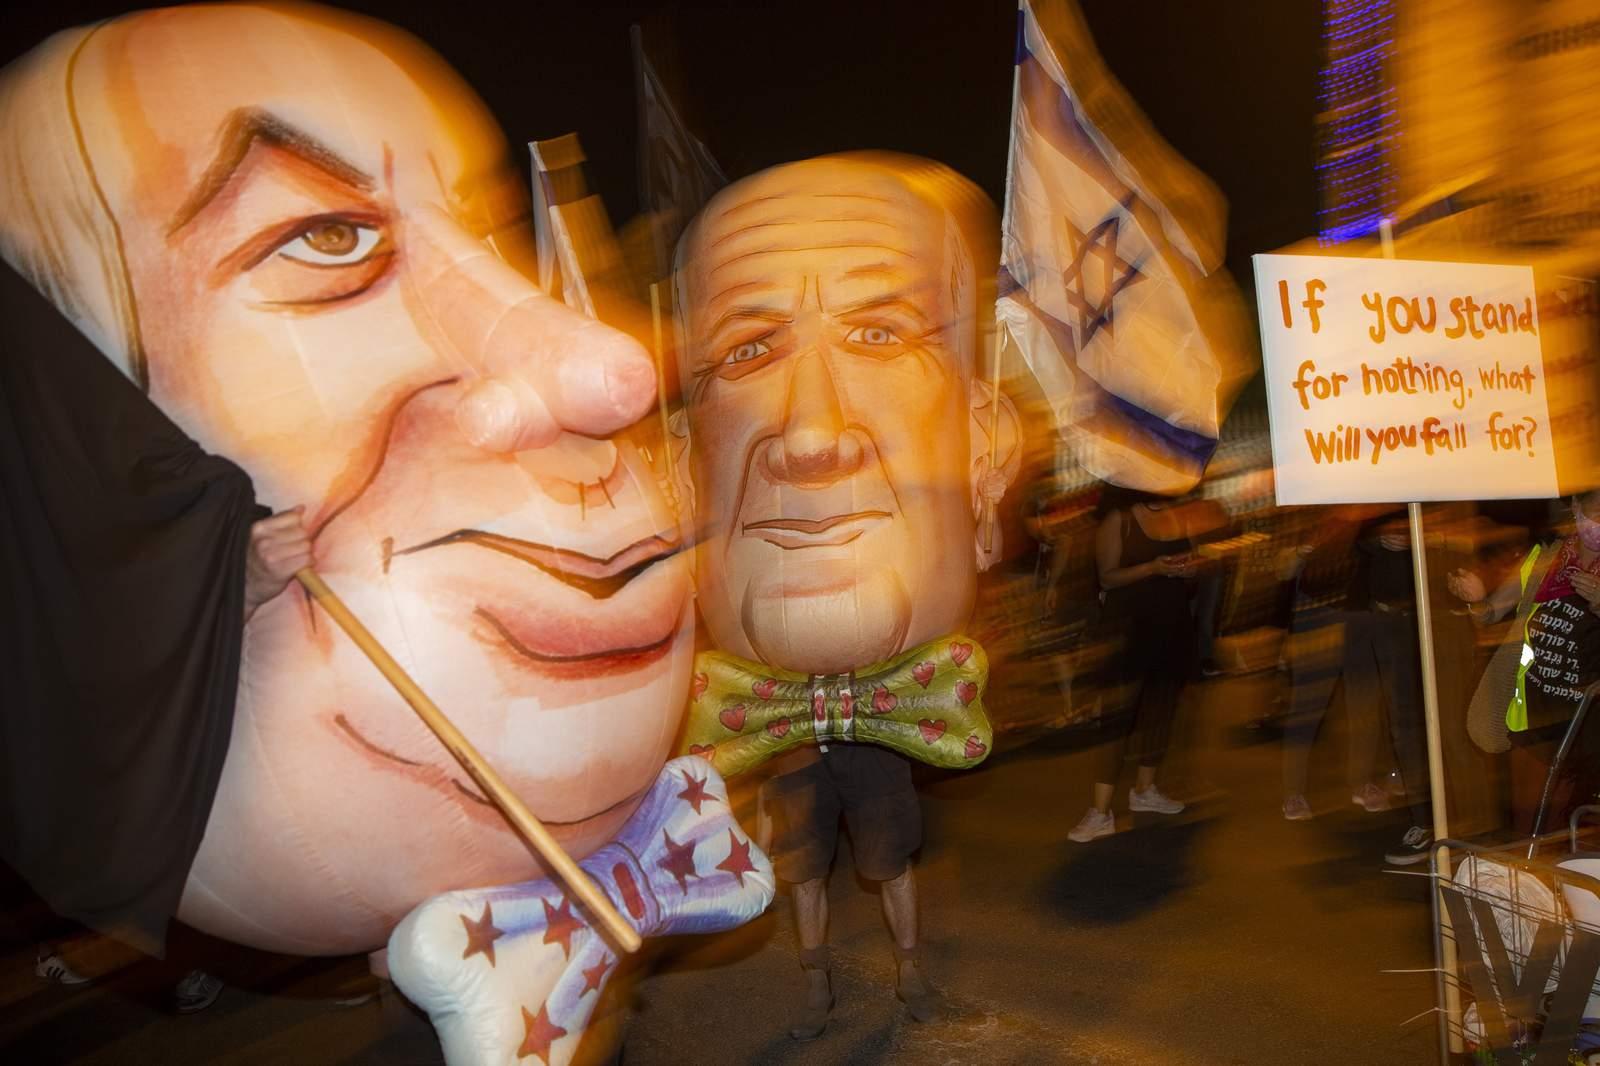 Israeli PM`s uneasy alliance seems headed toward collapse